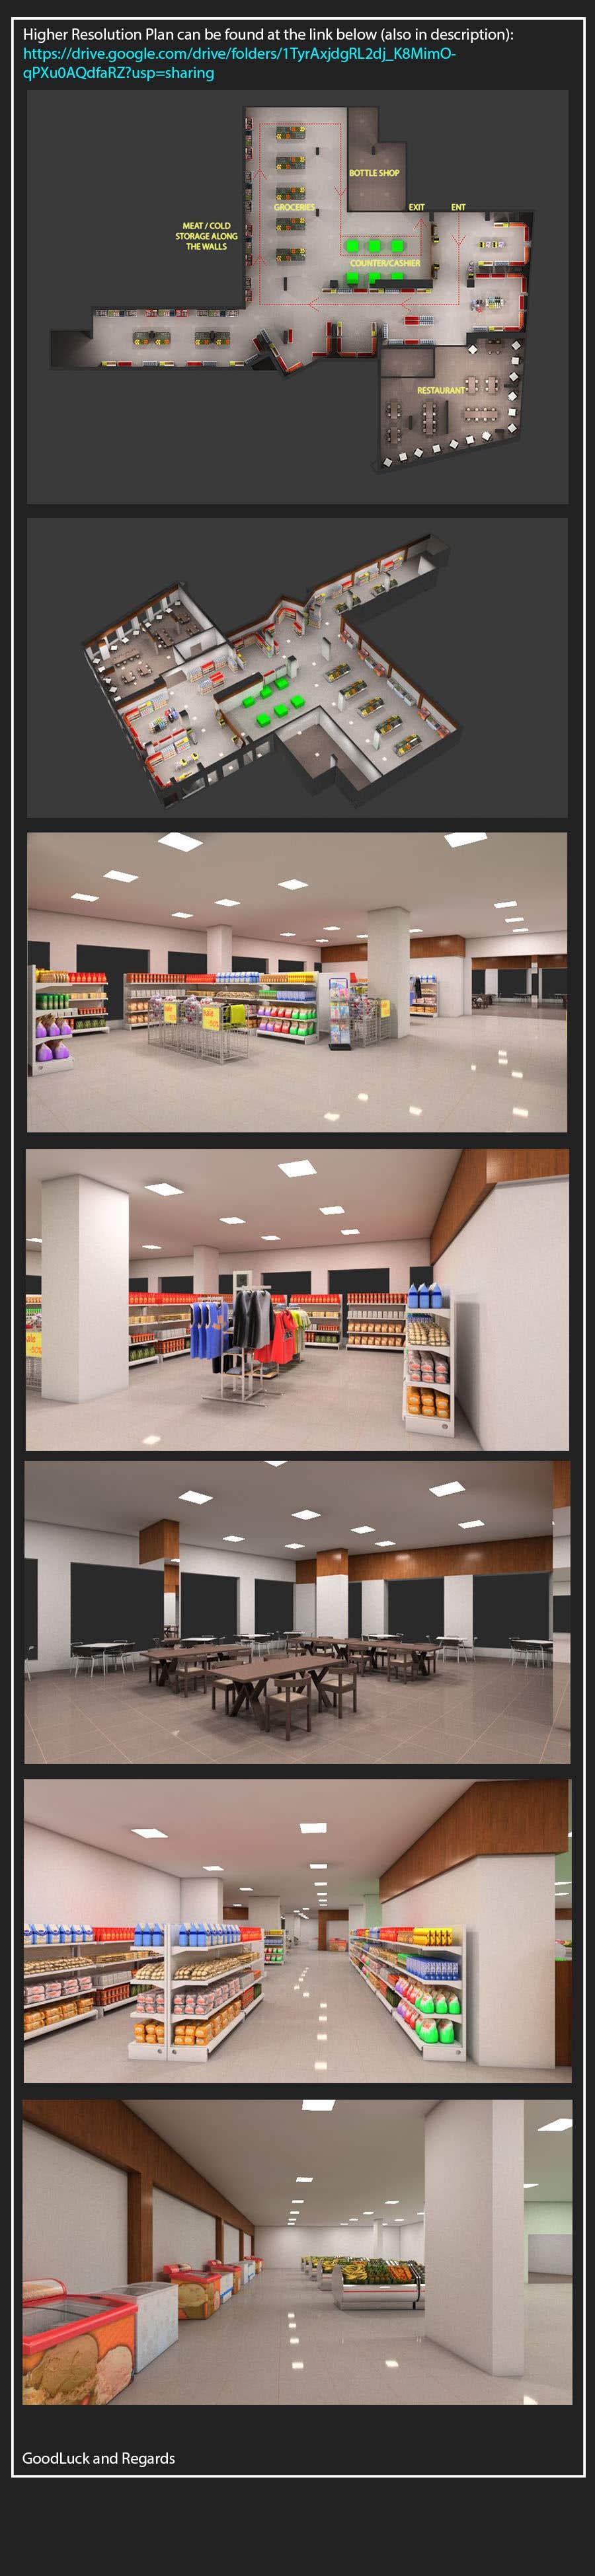 Inscrição nº                                         33                                      do Concurso para                                         Looking for a Supermarket Design/Layout/3D model with a space of 1,499sqm